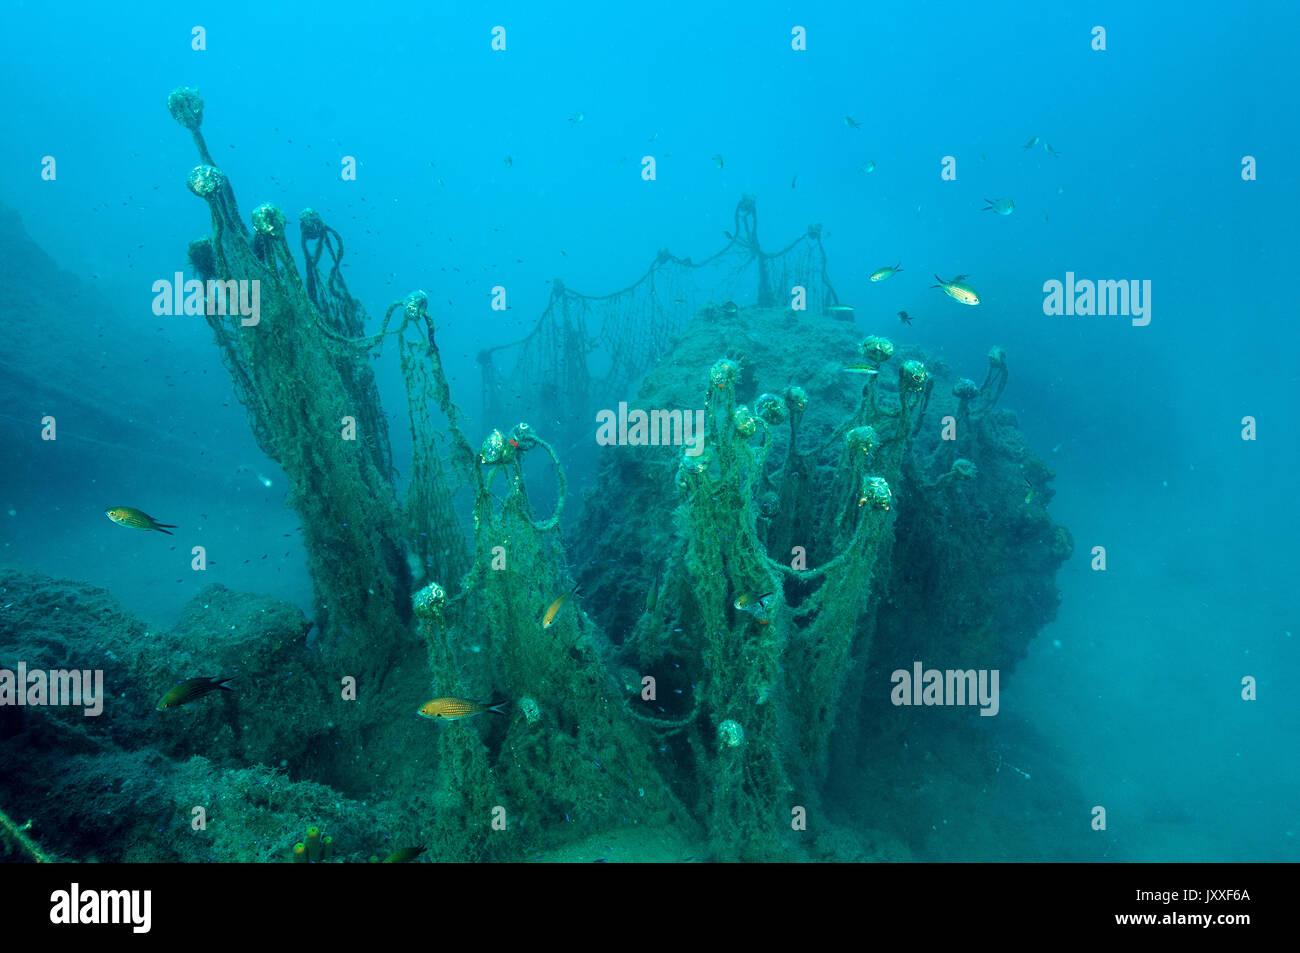 Ghost nets, lost fishing gear in Gokova Bay Marine Protected Area Turkey - Stock Image